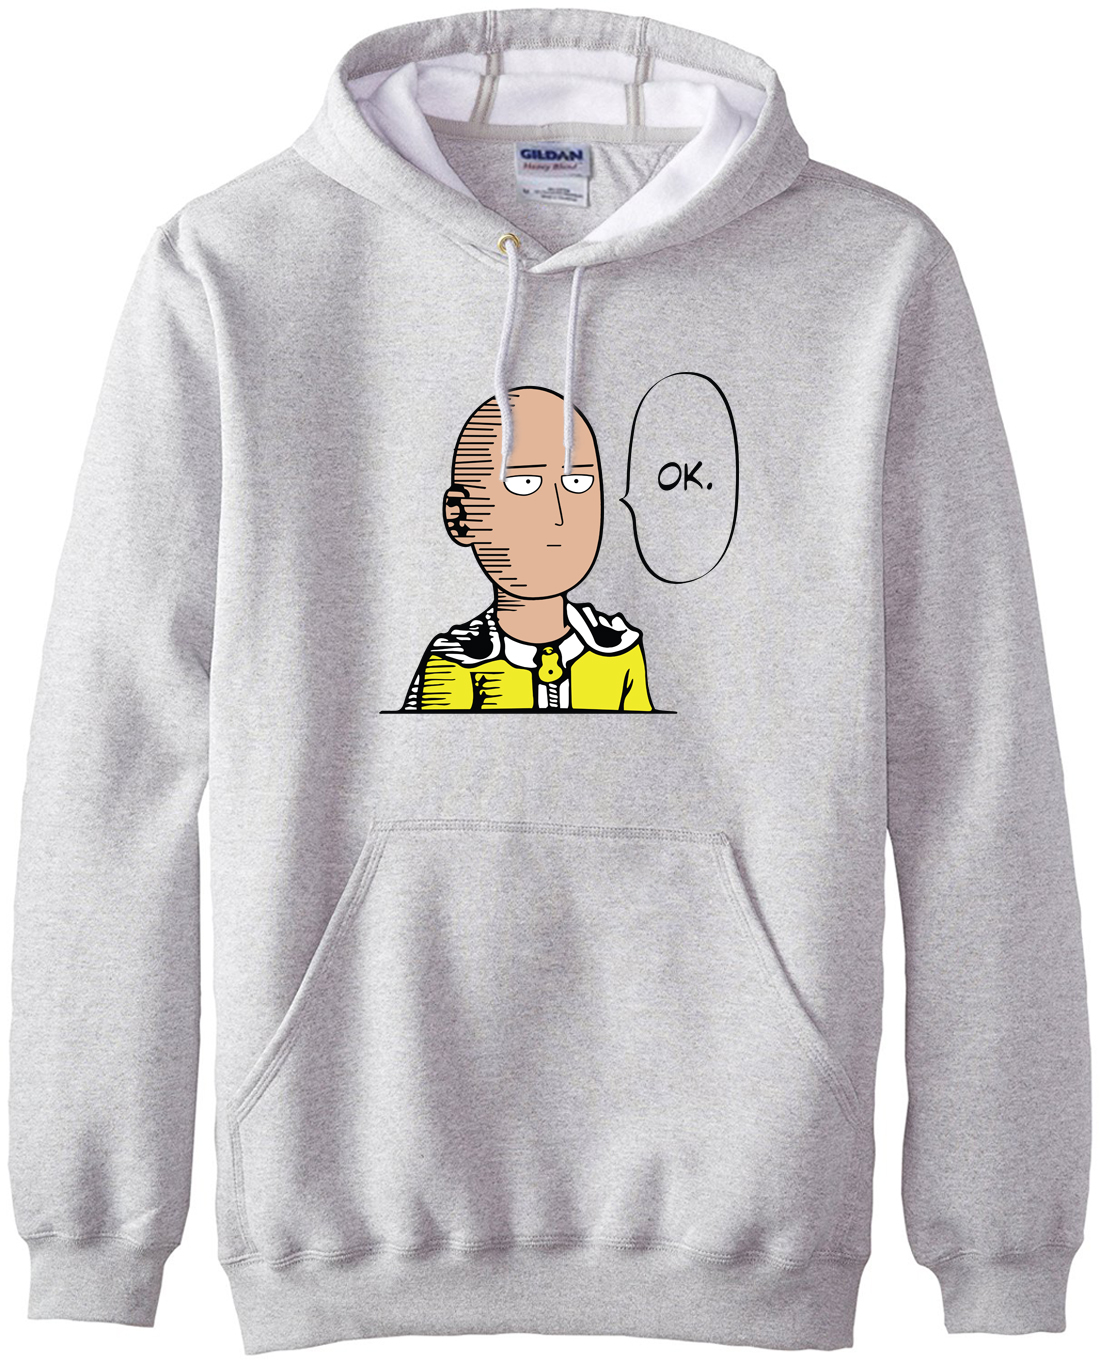 Neue ankunft Anime One Punch Mann Hoodies OK Printed Männer Sweatshirts 2017 frühling winter warme fleece lose fit herren sportbekleidung